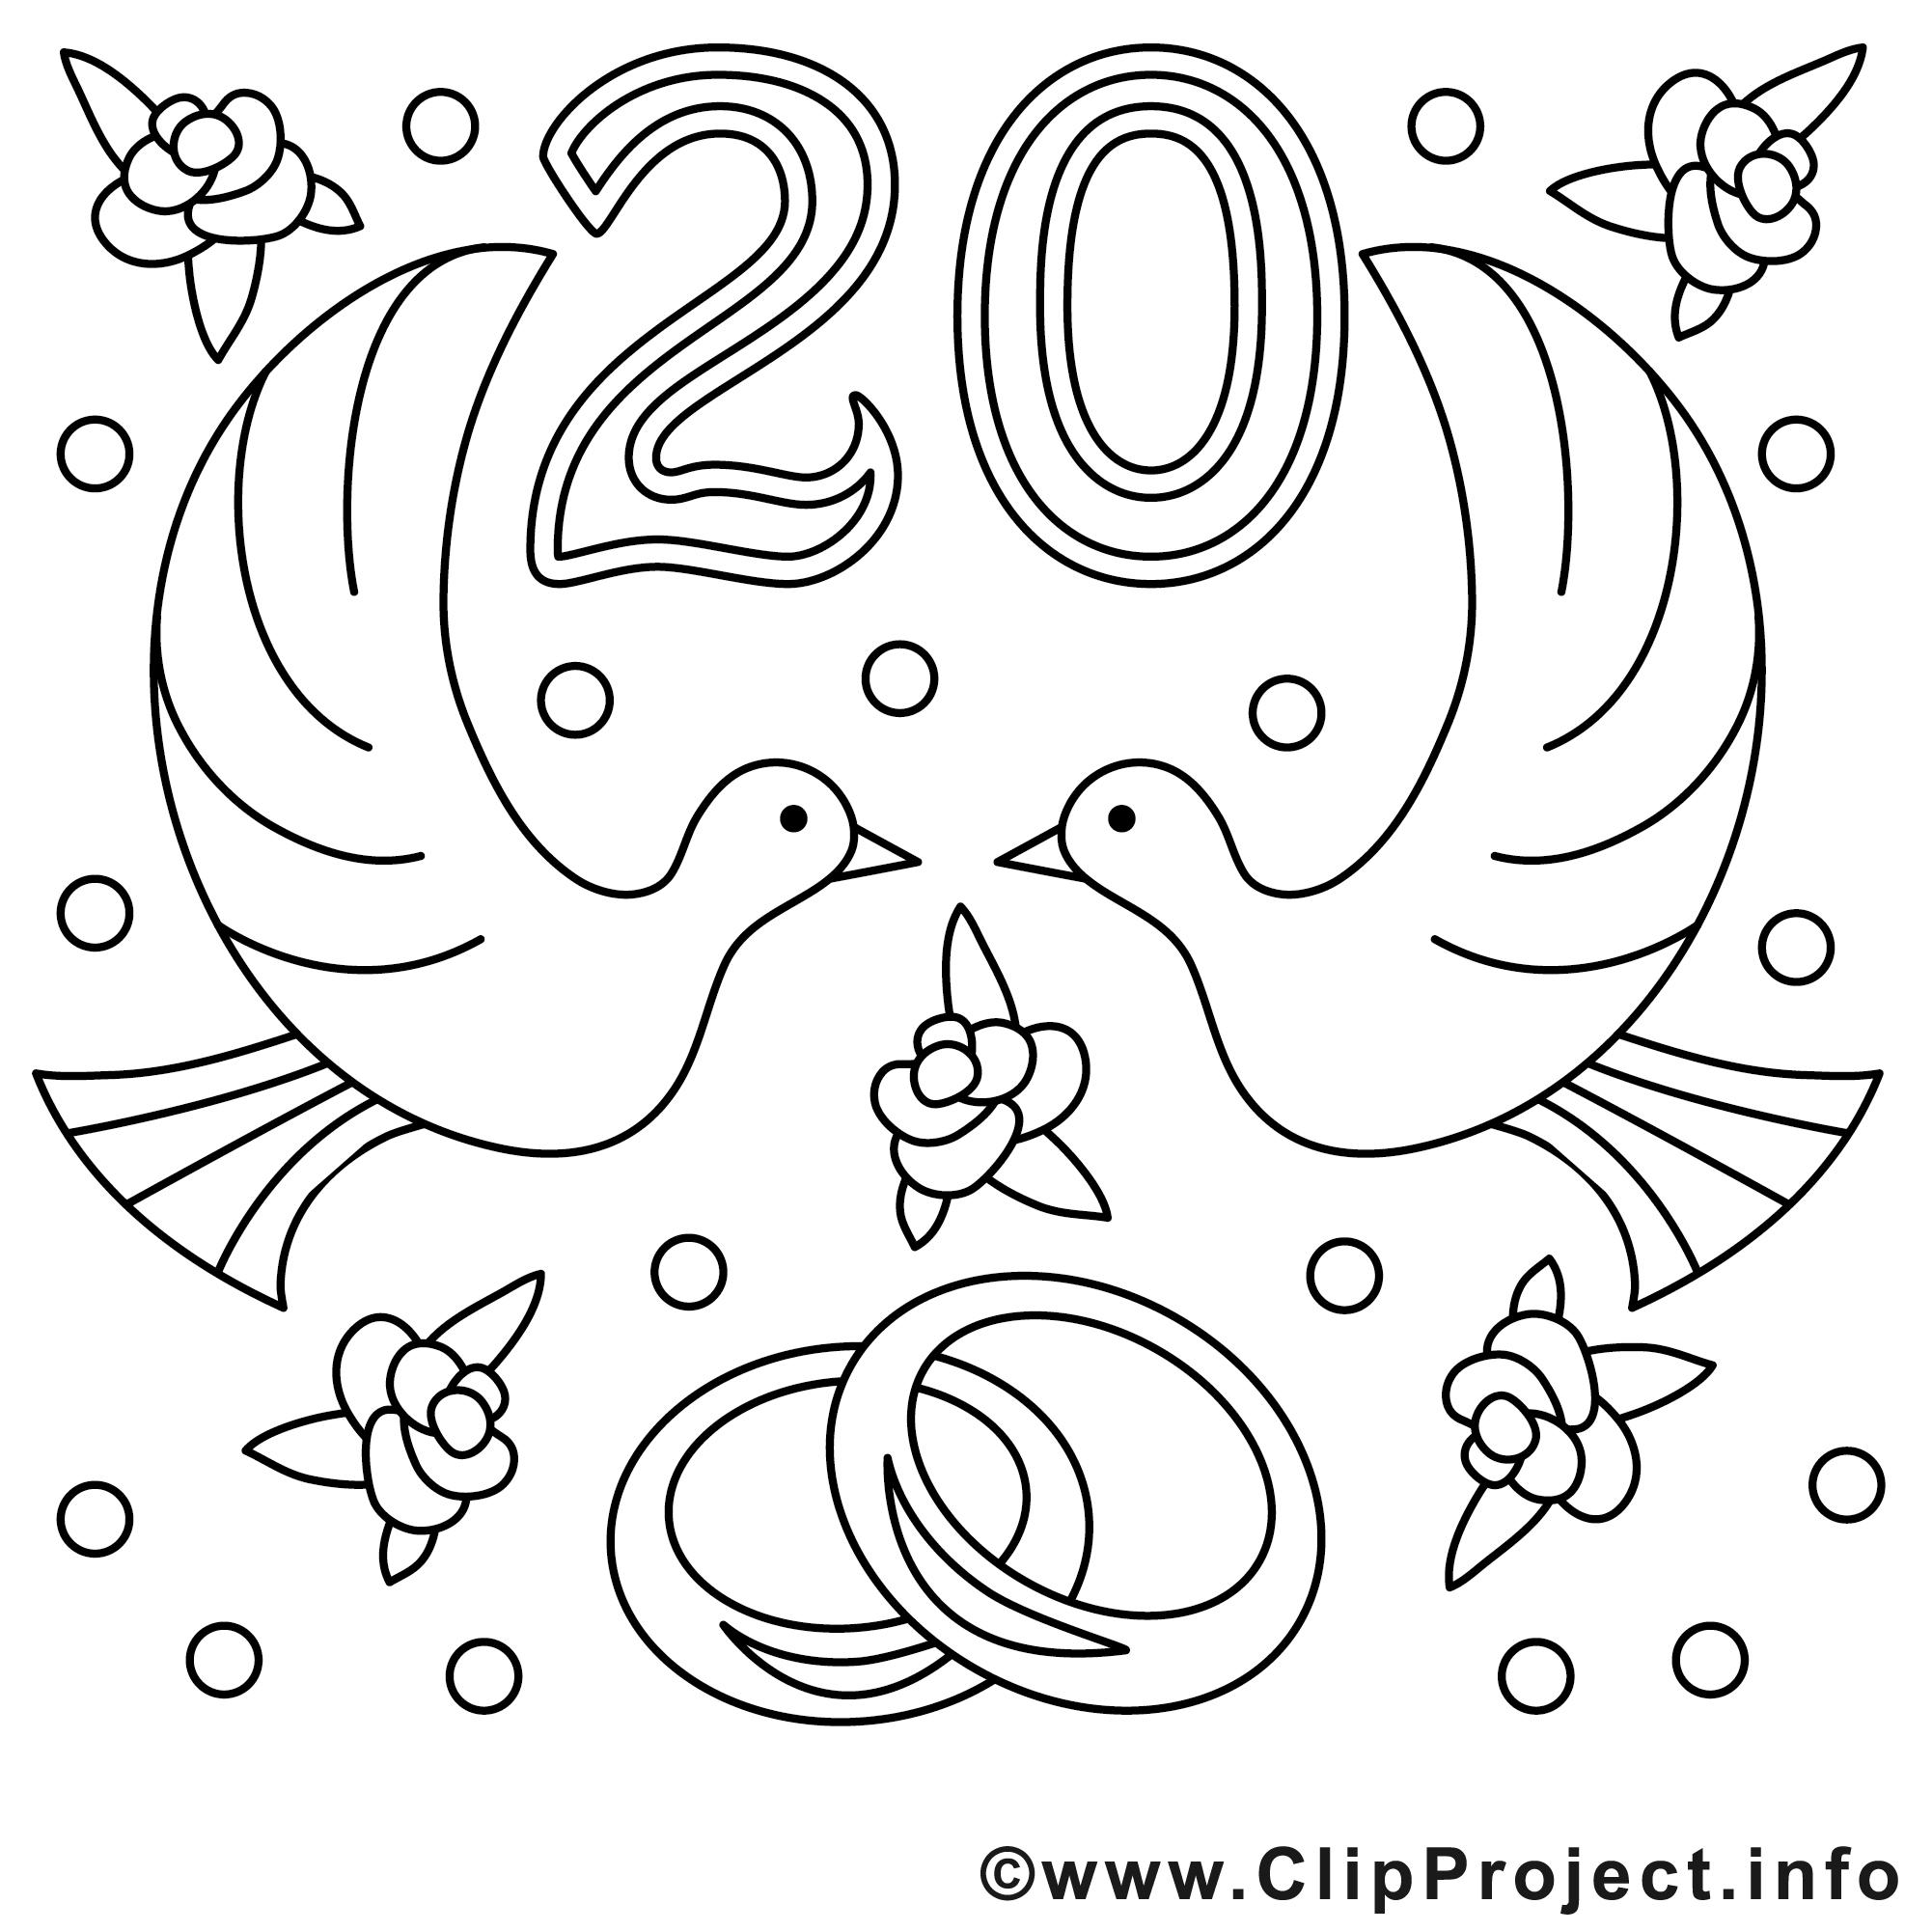 20 ans illustration mariage colorier mariage coloriages dessin picture image graphic - Dessin anniversaire 20 ans ...